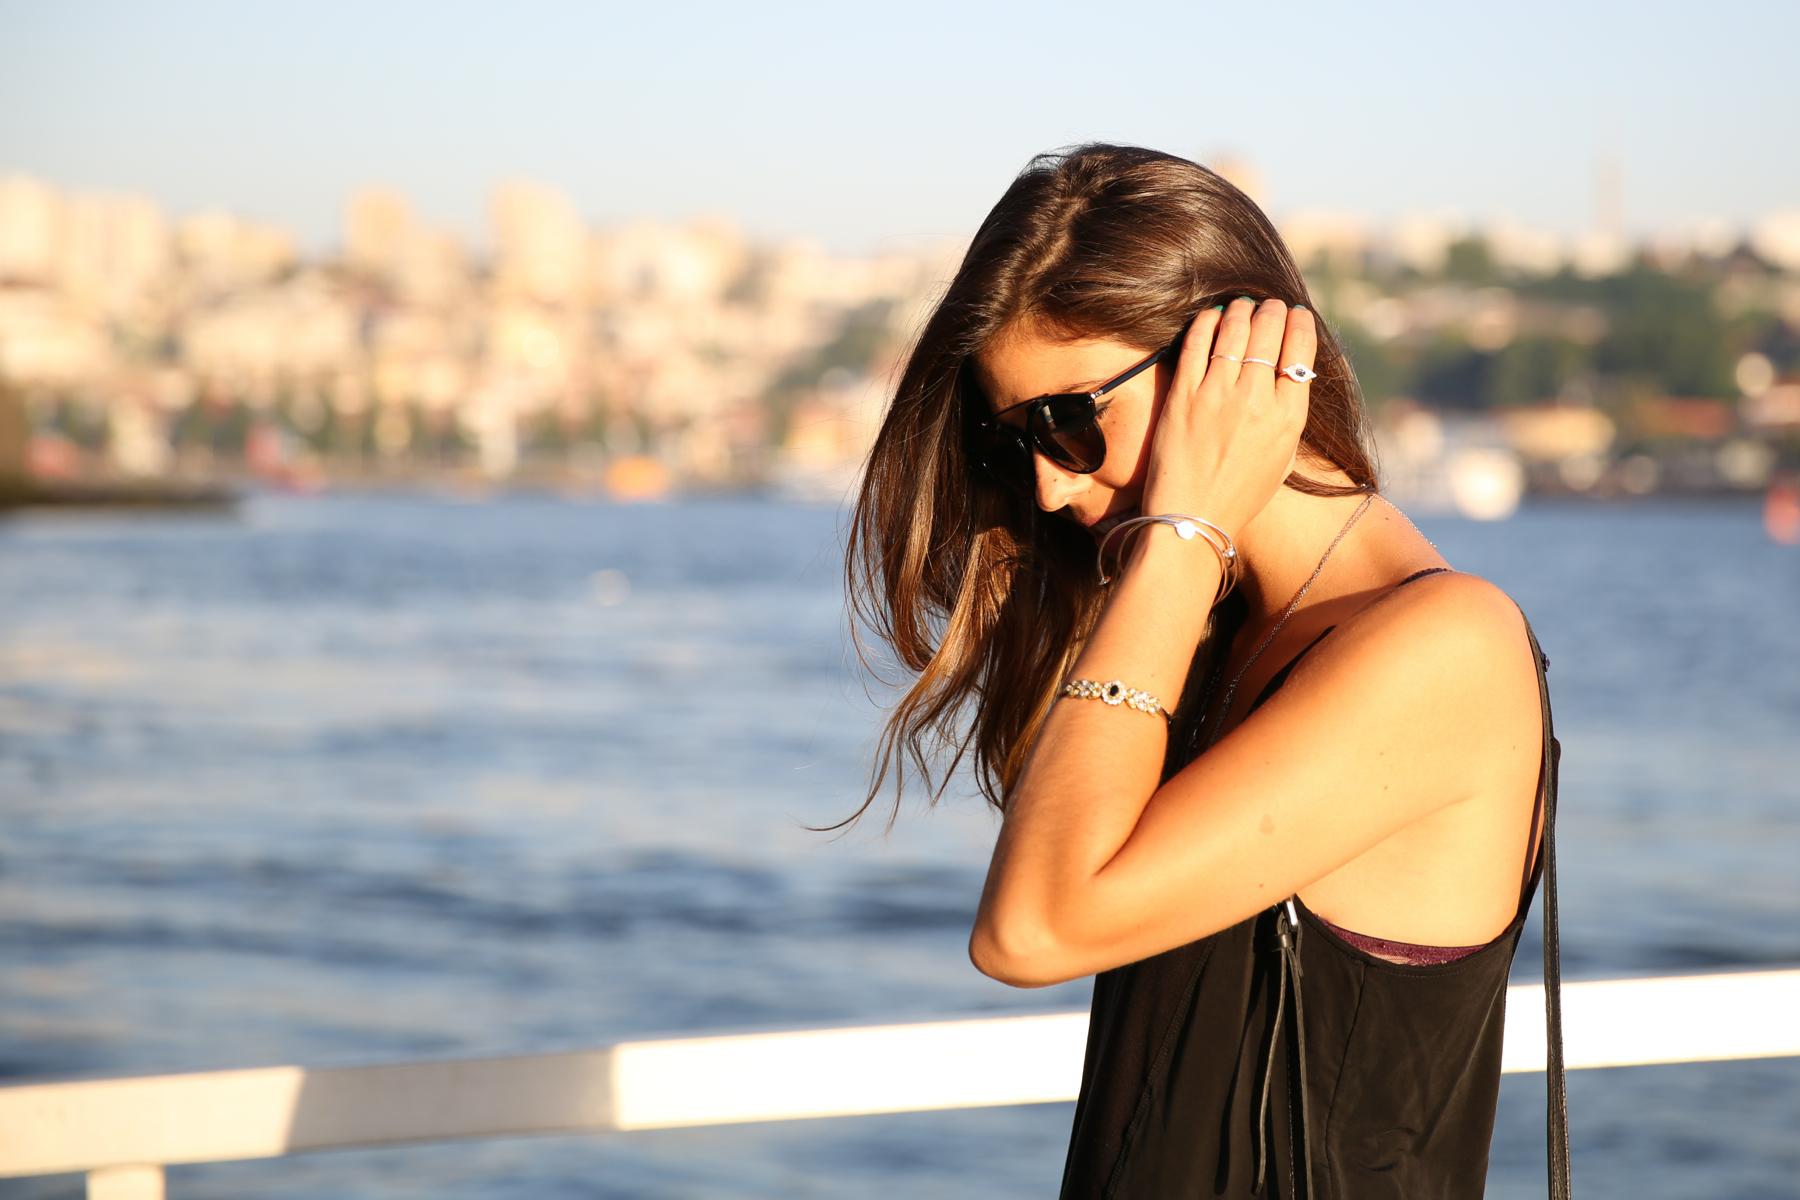 trendy_taste-look-outfit-street_style-ootd-blog-blogger-fashion_spain-moda_españa-salsa_jeans-dior_gafas-bolso_flecos-fringes_bag-khaki_shorts-shorts_caqui-grey_tee-camiseta_gris-verano-porto-portugal-10